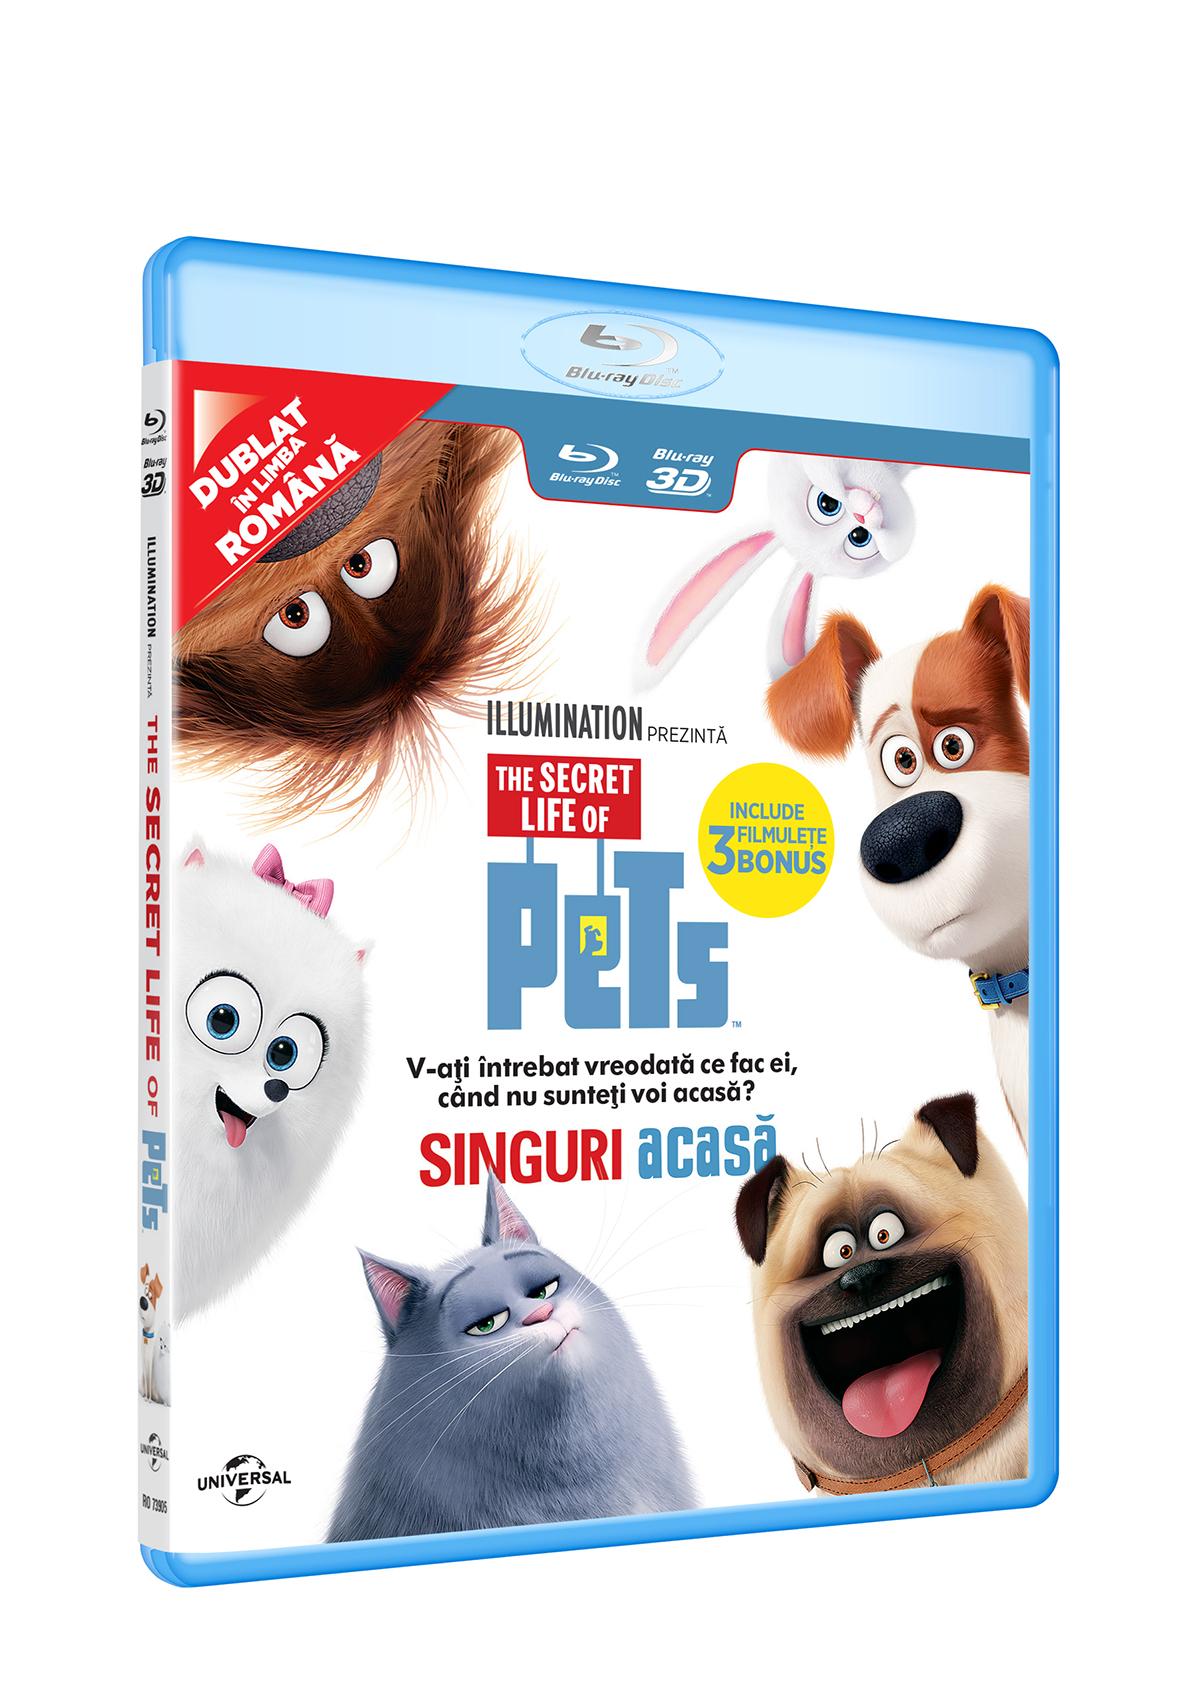 Singuri Acasa 2D+3D (Blu Ray Disc) / The Secret Life of Pets